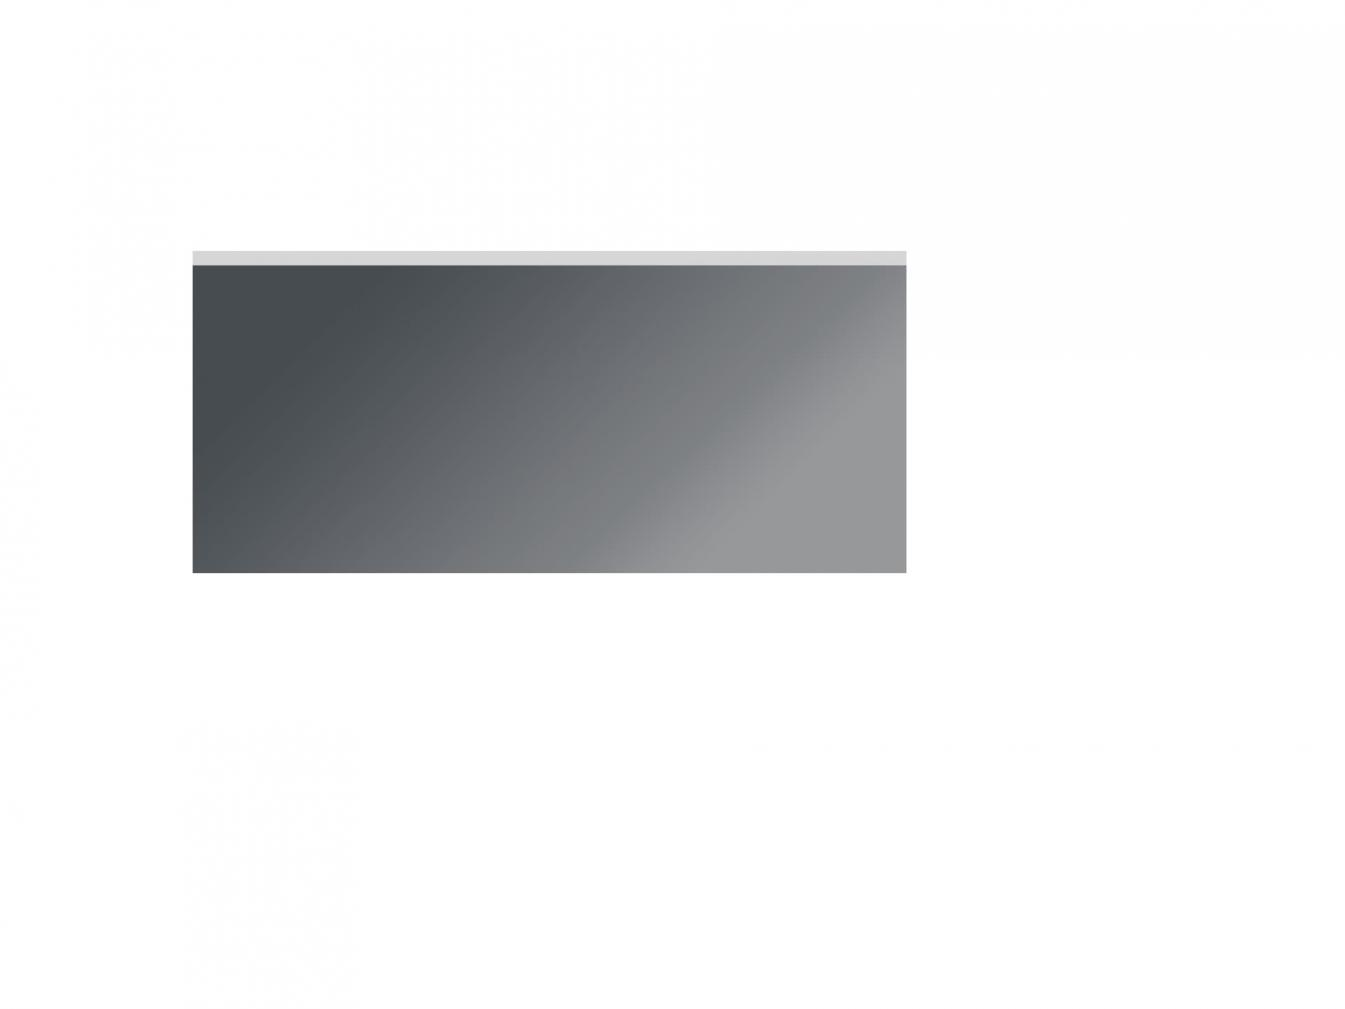 badspiegel adria mit beleuchtung oben. Black Bedroom Furniture Sets. Home Design Ideas